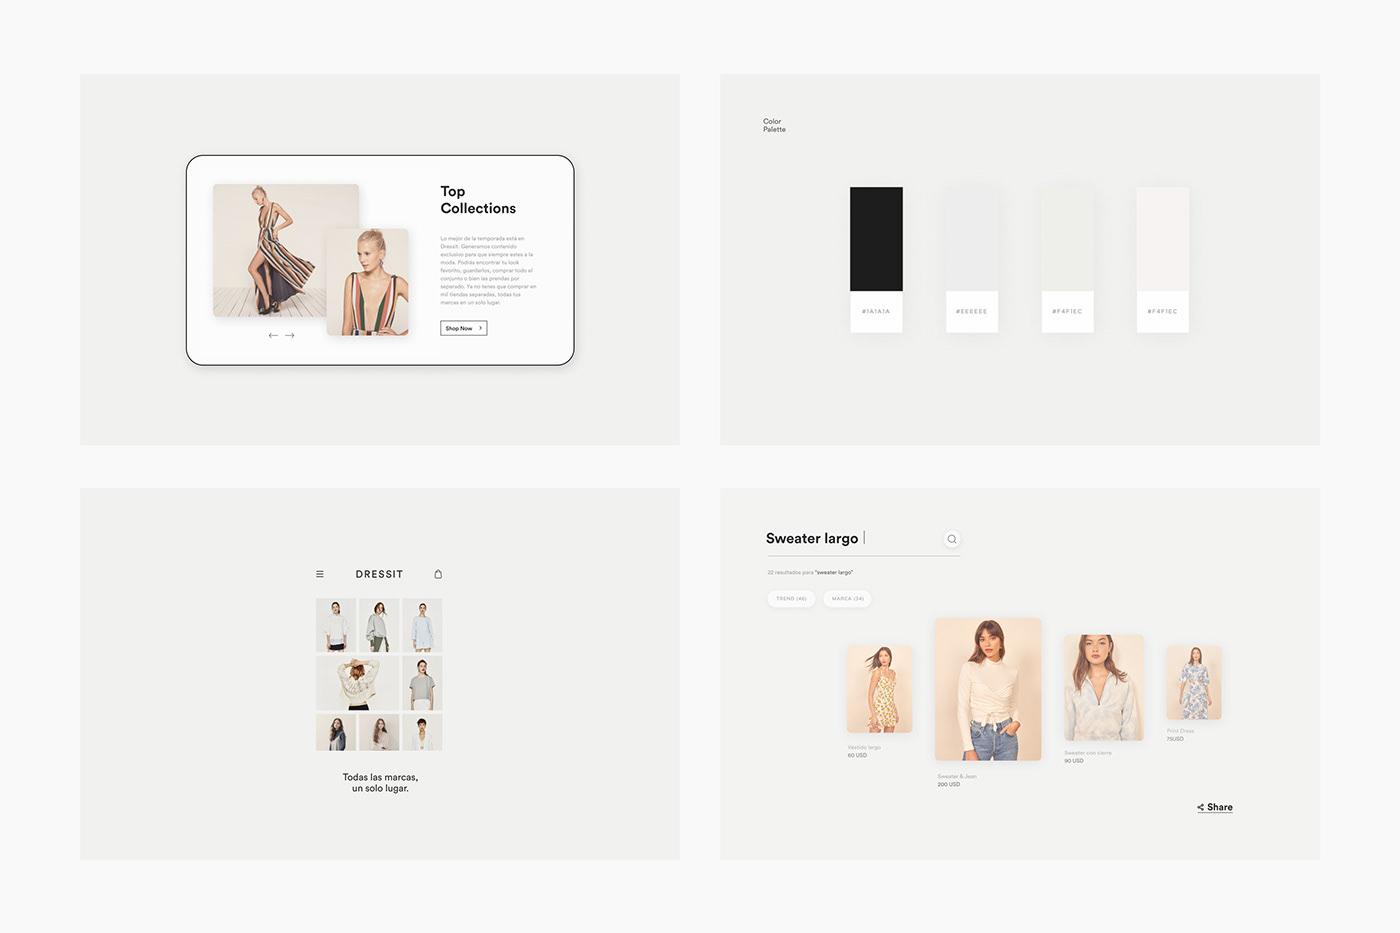 brand branding  design dress Fashion  Logotype marcas moda Shopping Web